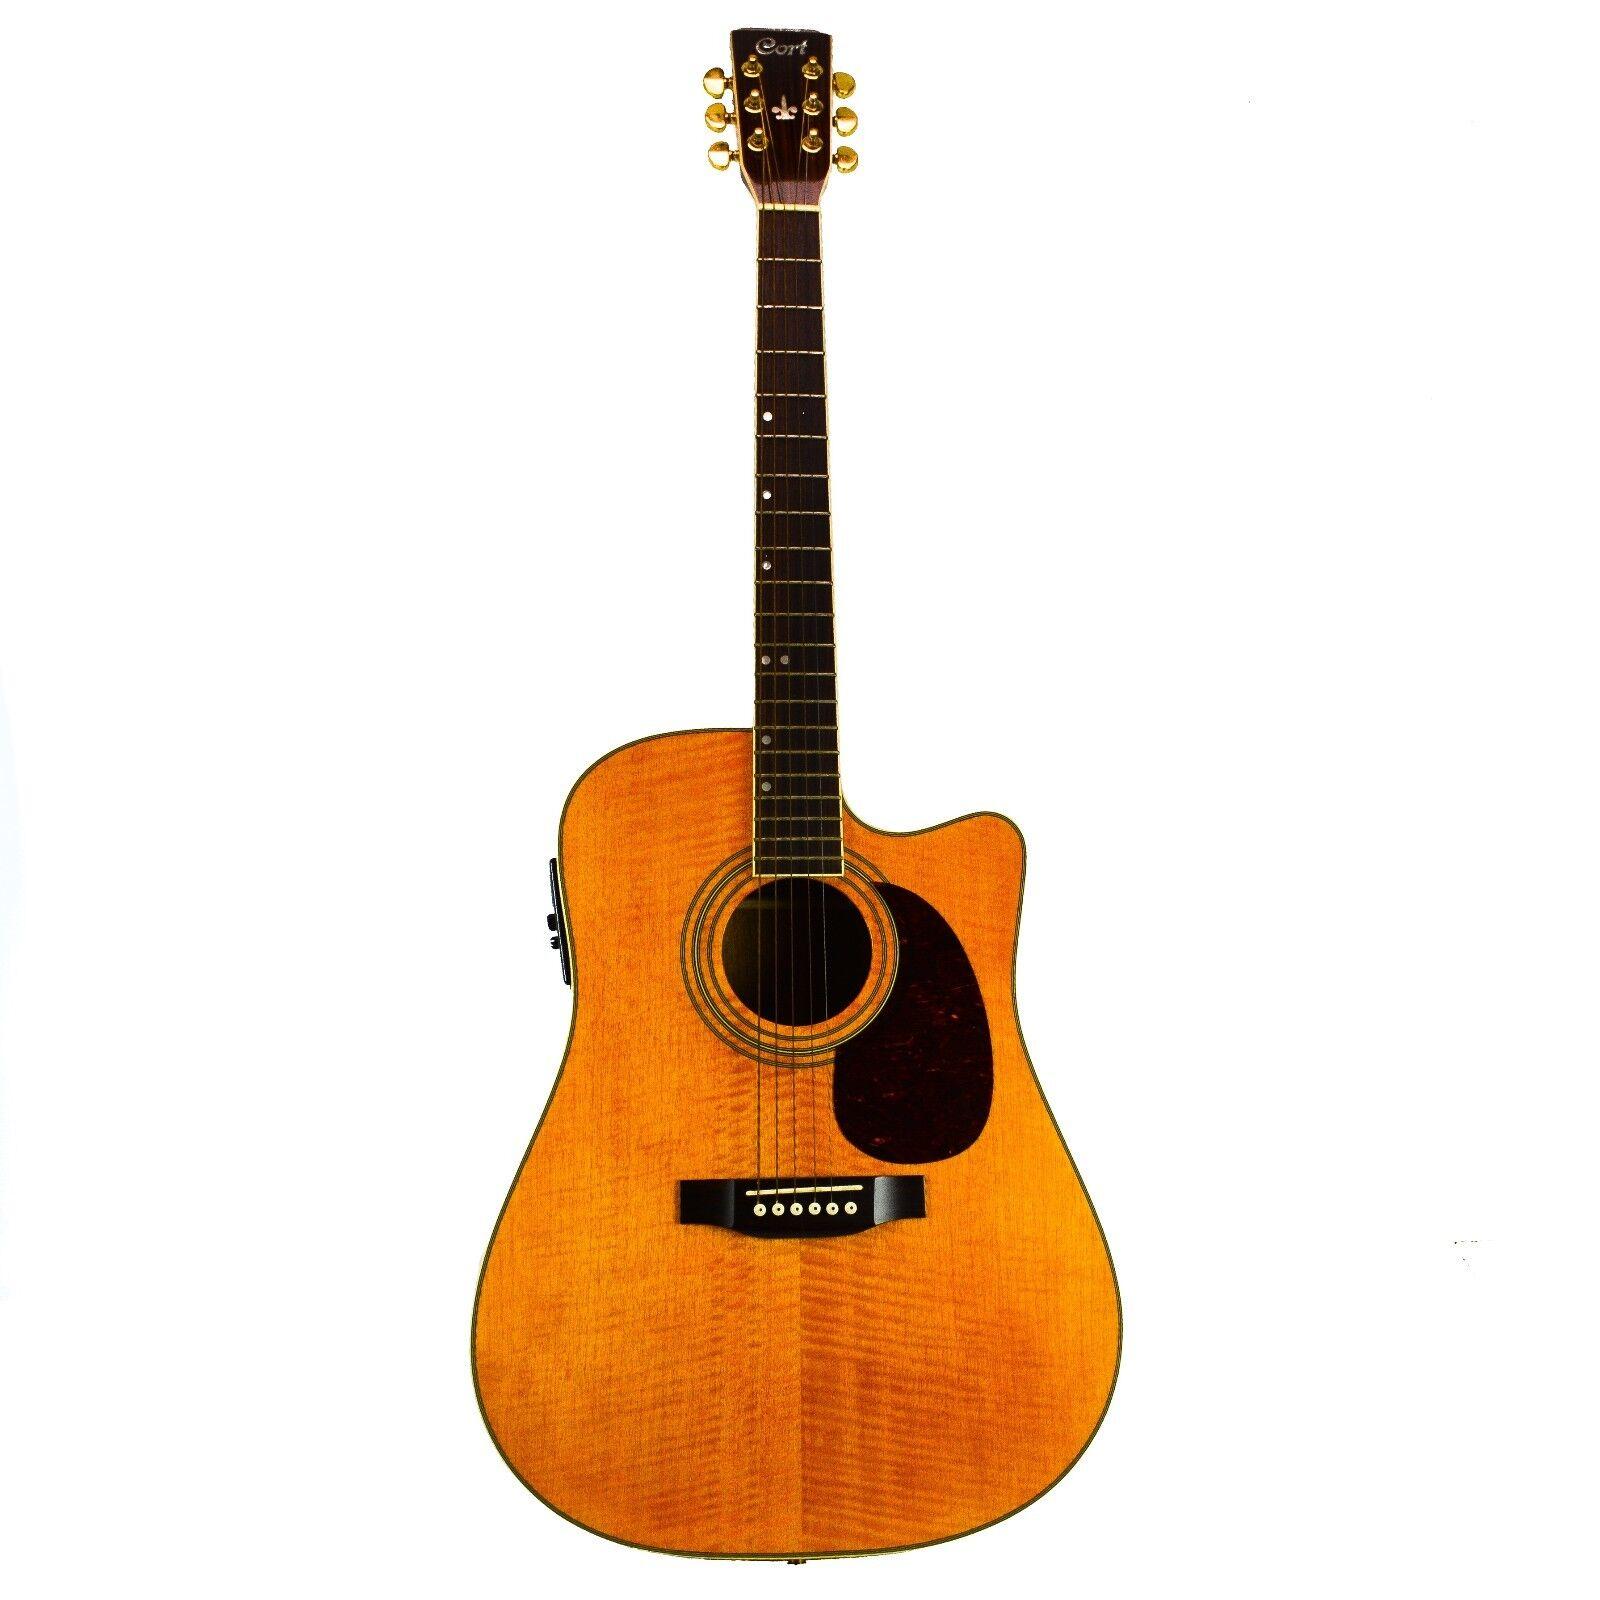 cort acoustic electric guitar korea cutaway hollow natural vintage round back. Black Bedroom Furniture Sets. Home Design Ideas